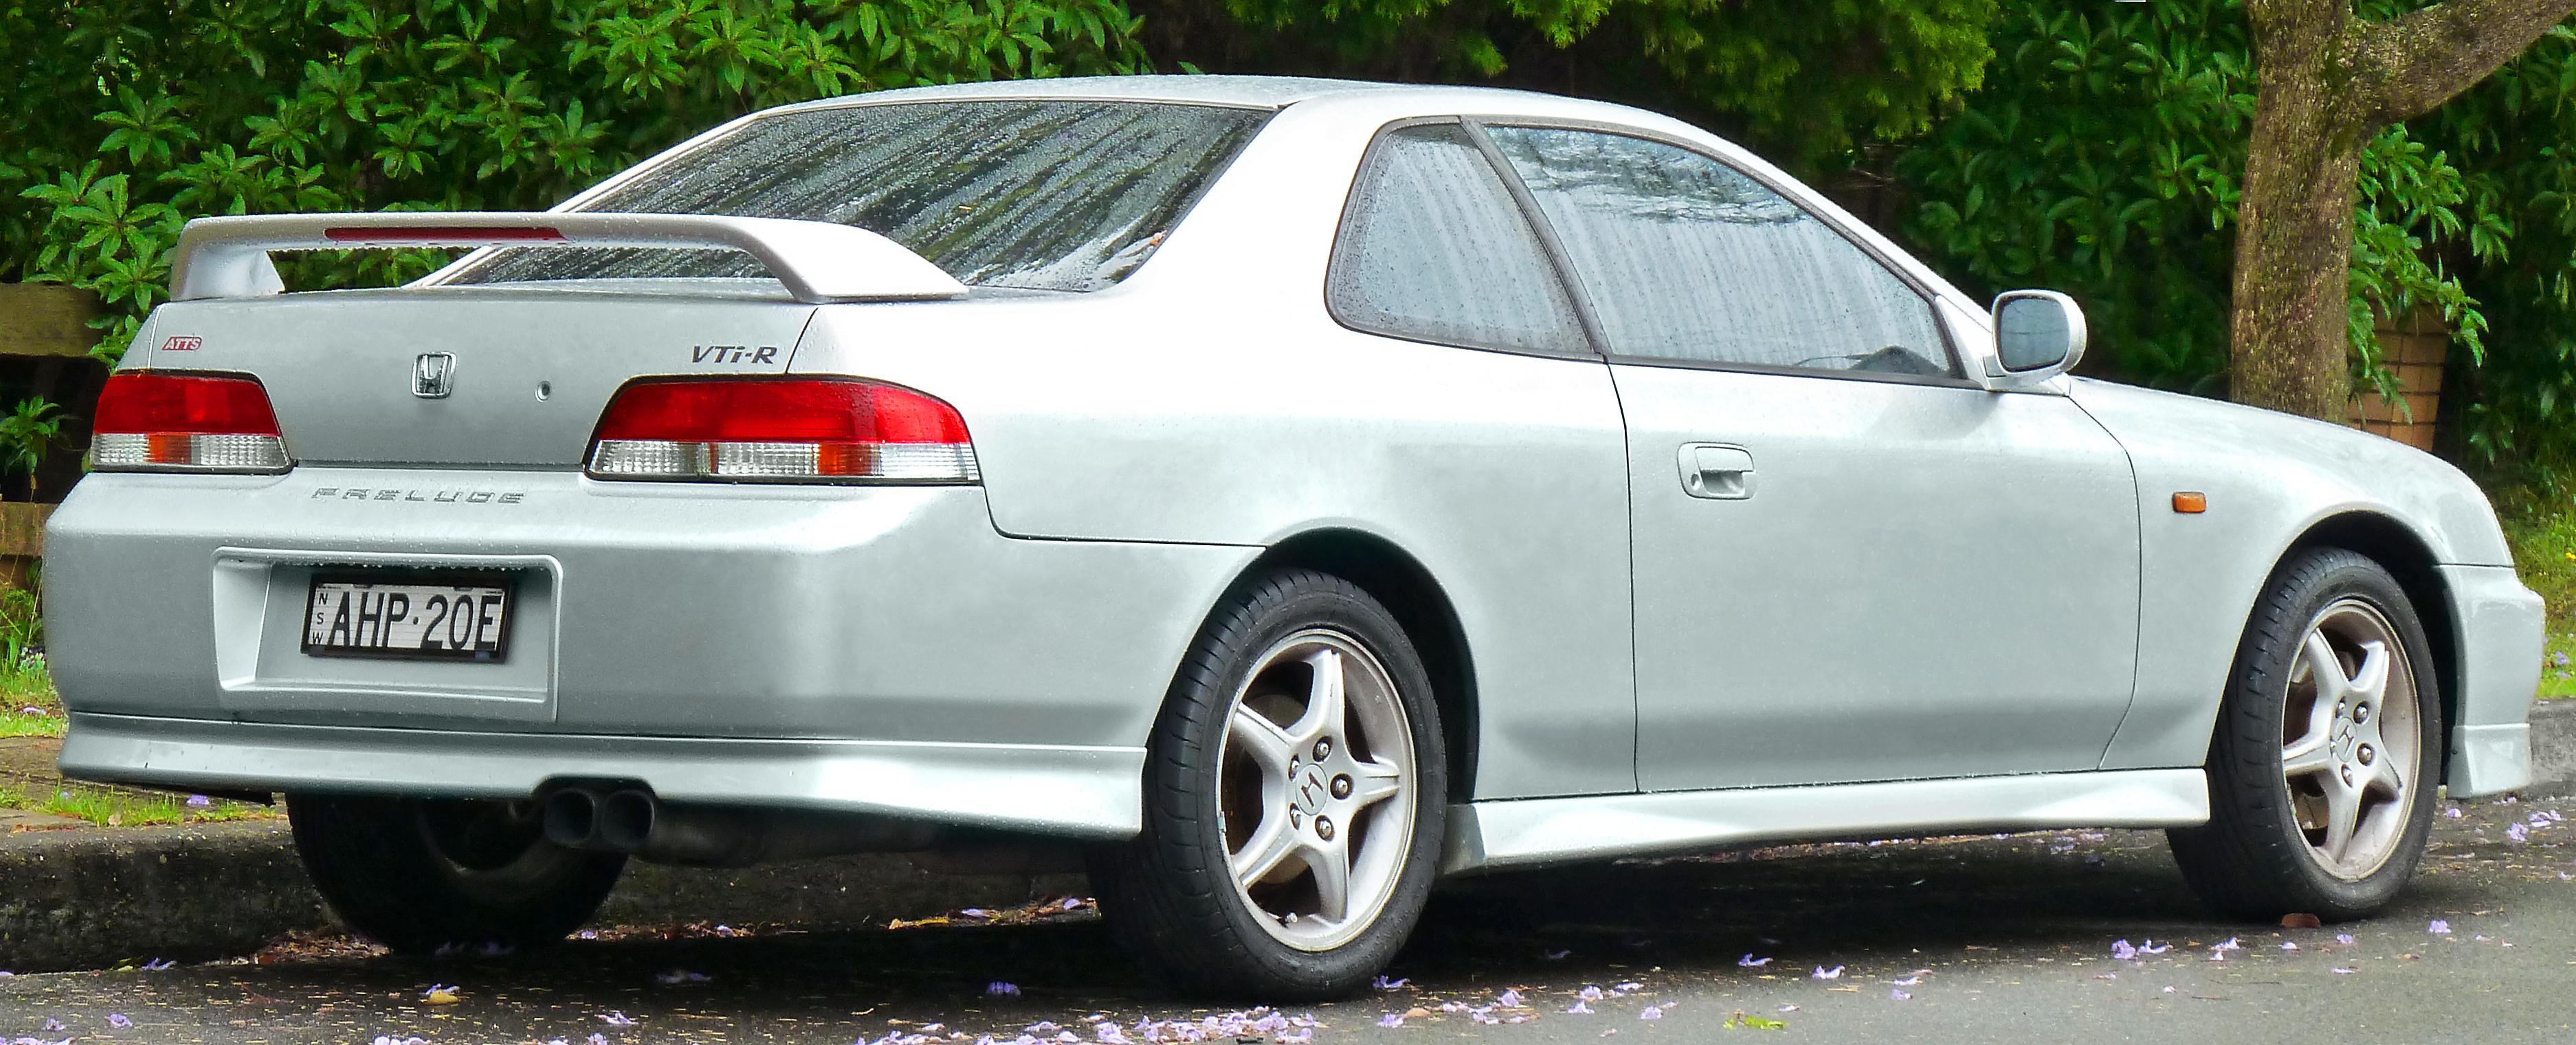 File 1997 2001 Honda Prelude Vti R Atts Coupe 2011 11 17 02 Jpg Wikimedia Commons